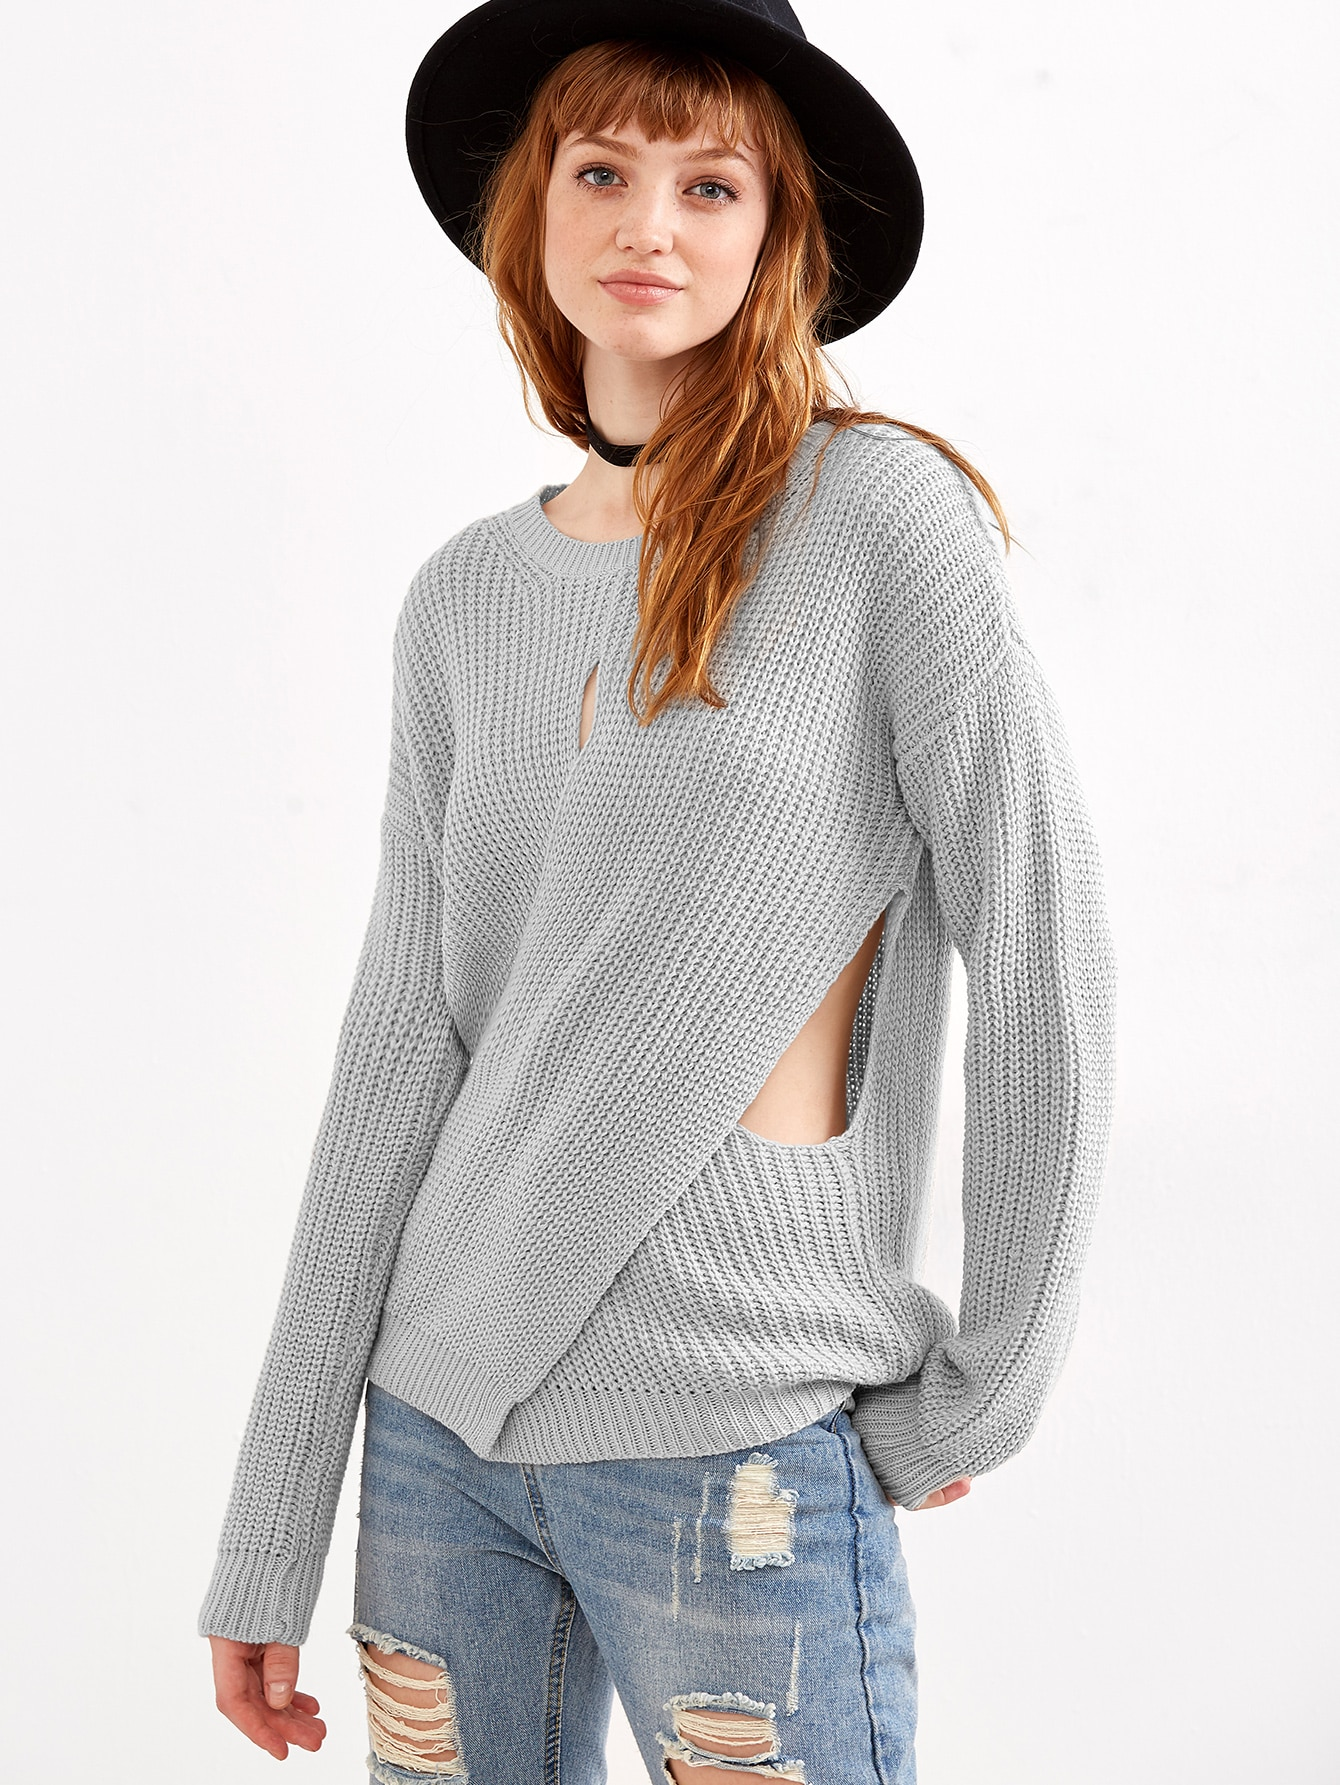 Grey Drop Shoulder Crossover SweaterGrey Drop Shoulder Crossover Sweater<br><br>color: Grey<br>size: one-size